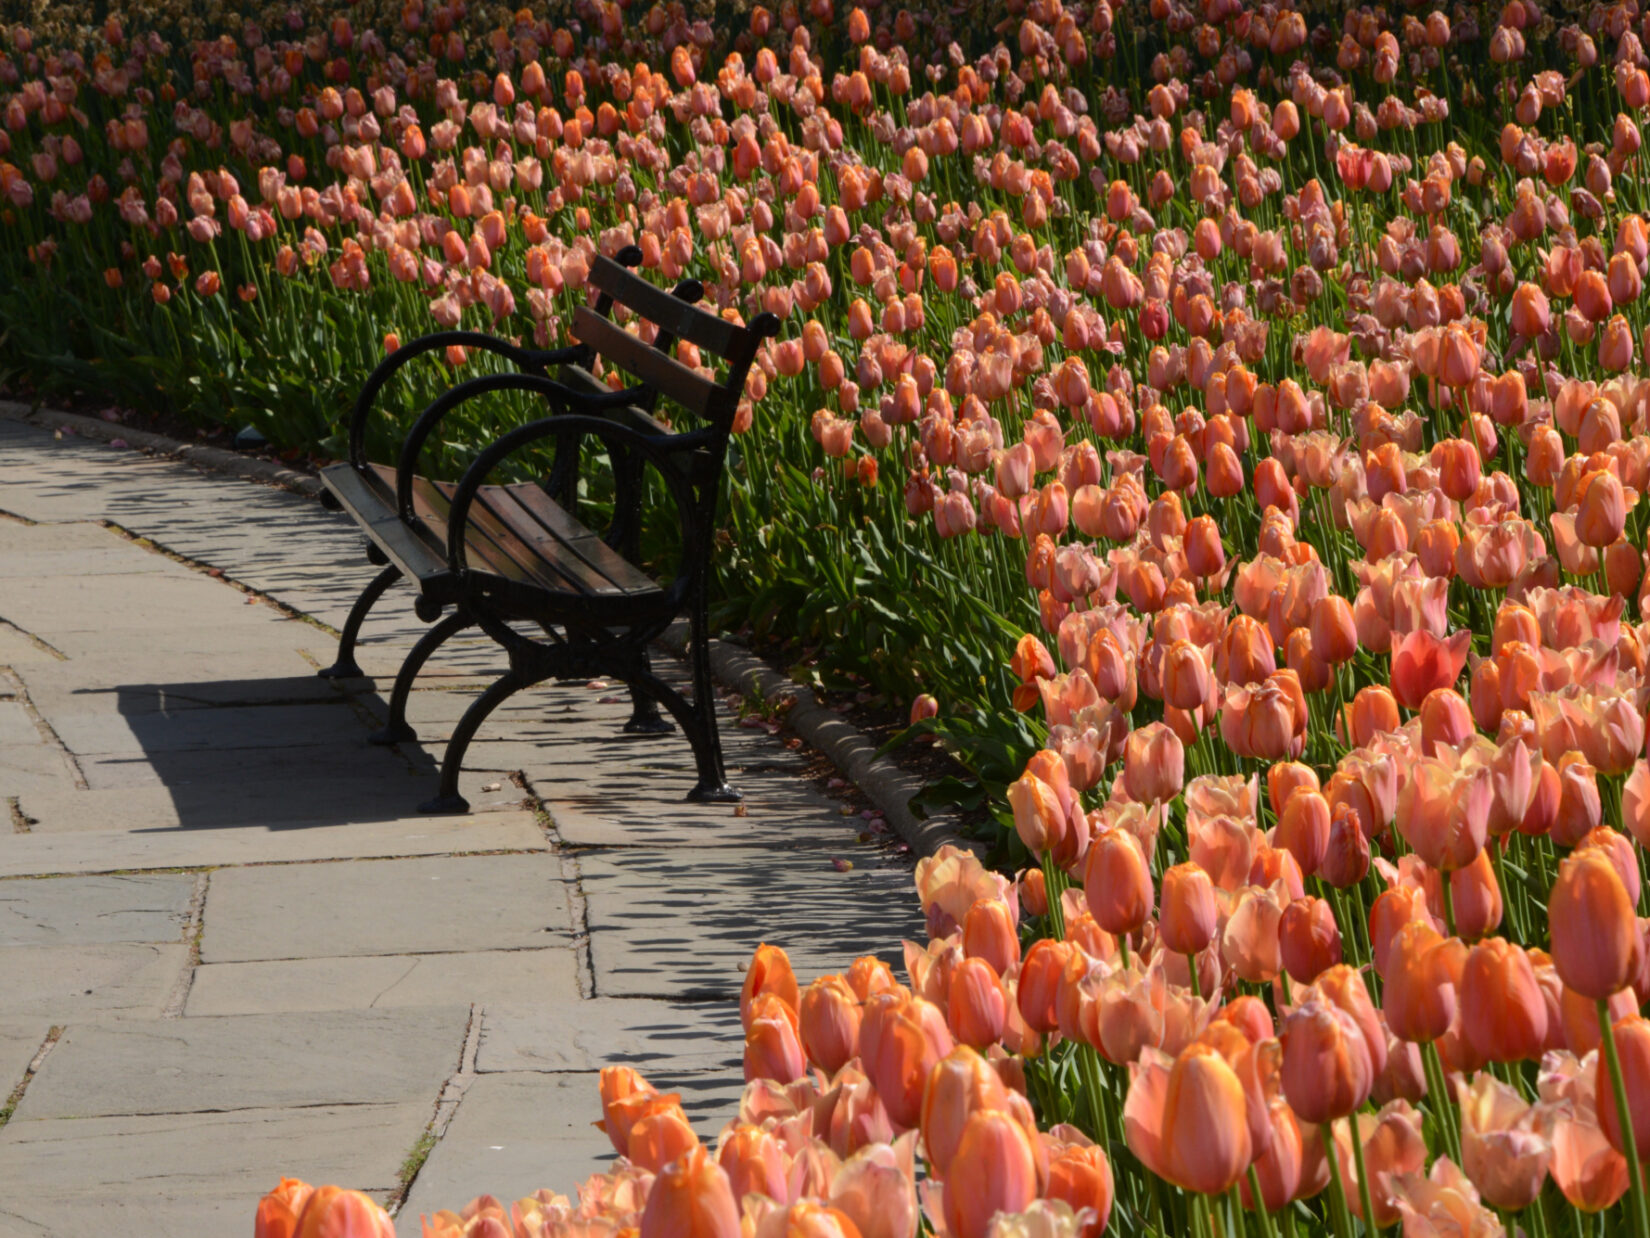 Tulips crowd behind an empty park bench in Conservatory Garden